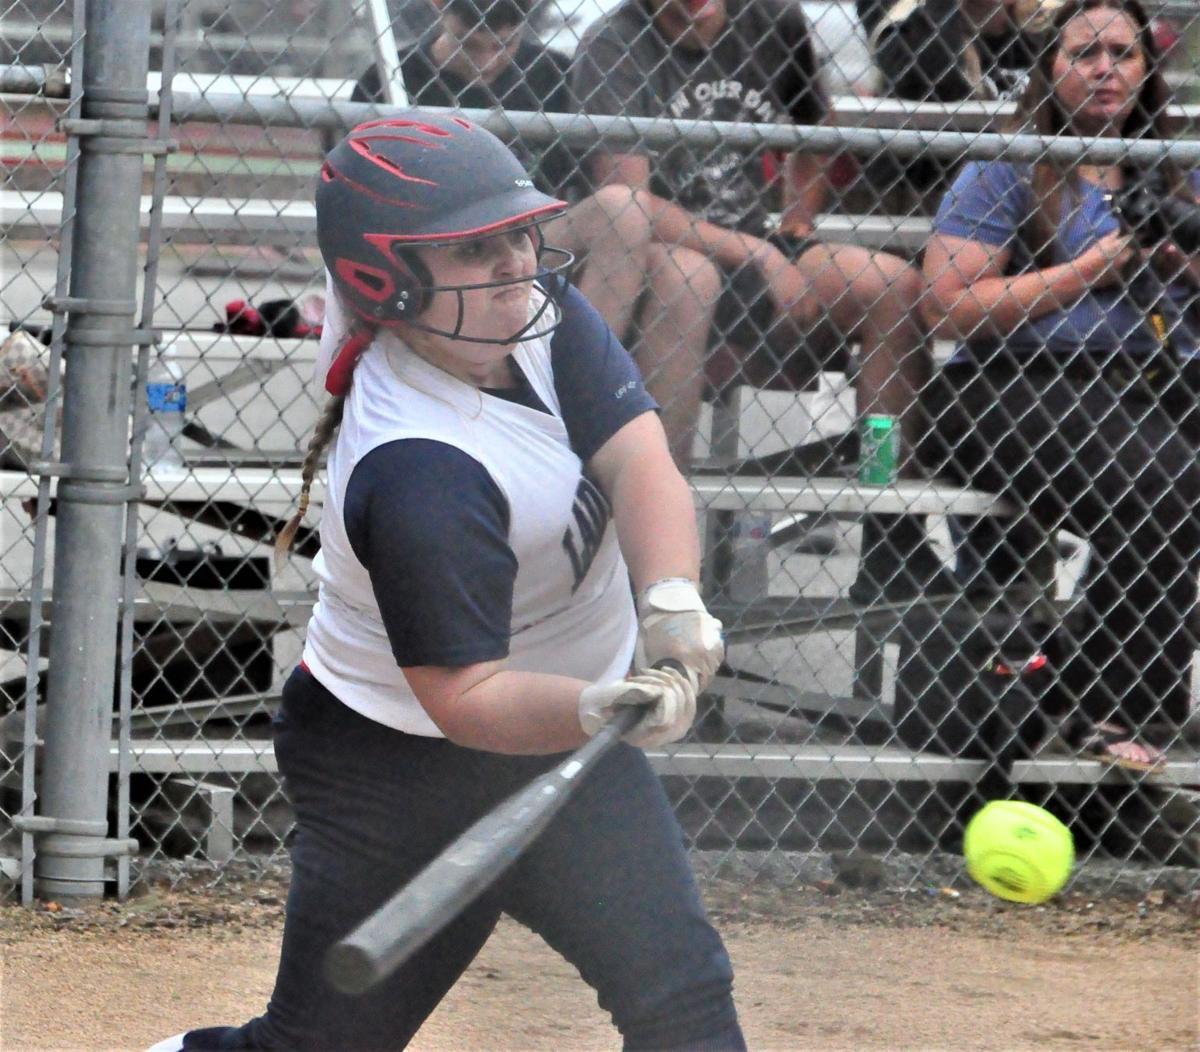 Man Tug Valley Ashlee Tomblin bat on ball.JPG